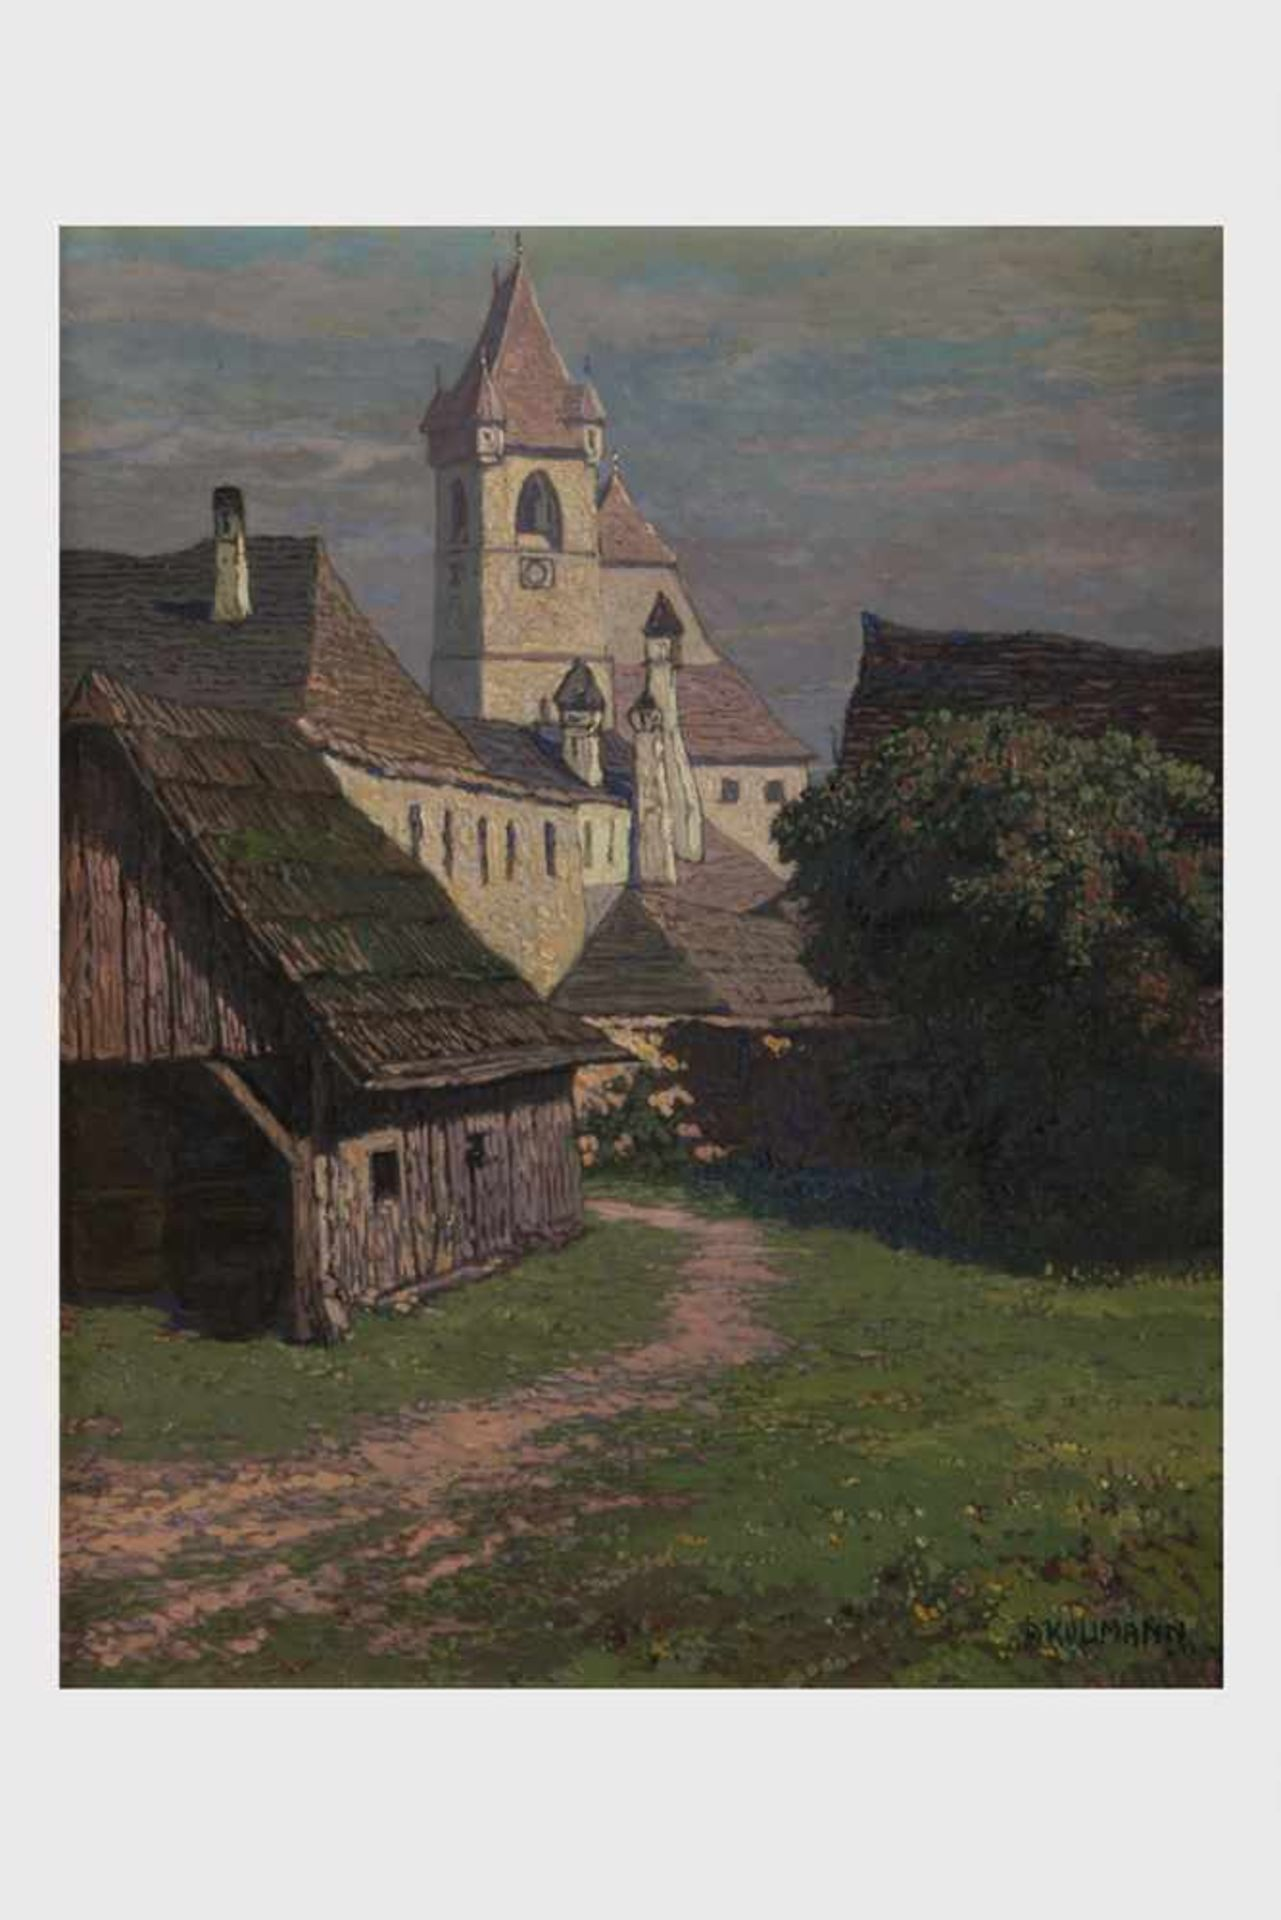 Los 8 - Albert Kollmann (Wien 1878-1962 Eisenstadt), Alt Eisenstadt, signiert A. Kollmann, Öl auf Malplatte,